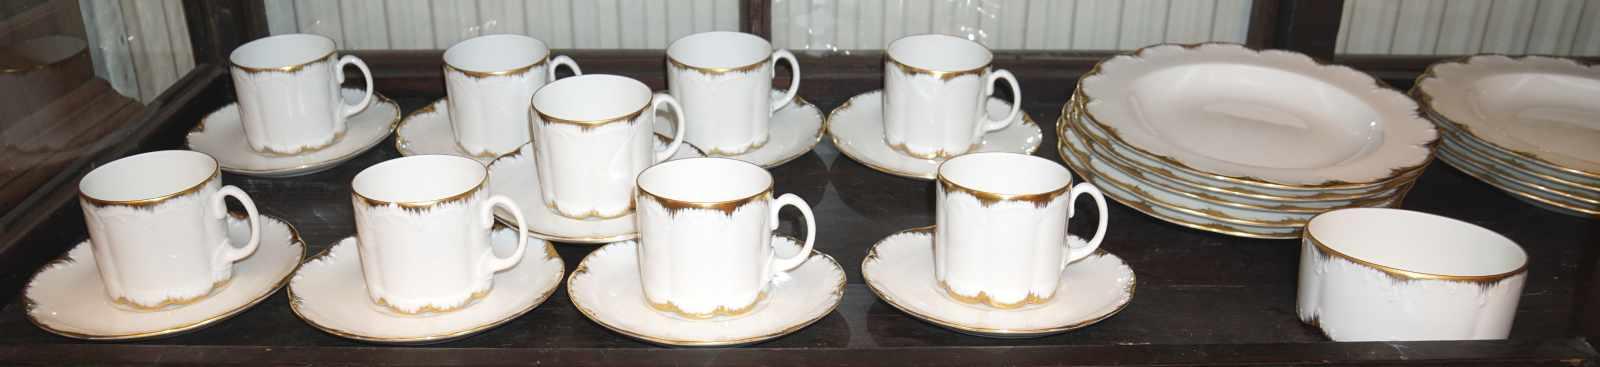 1 Kaffee-/SpeiserestservicePorz. ROSENTHAL GROUP goldstaff. f. ca. 9 Pers. ber. Asp. - Bild 2 aus 3